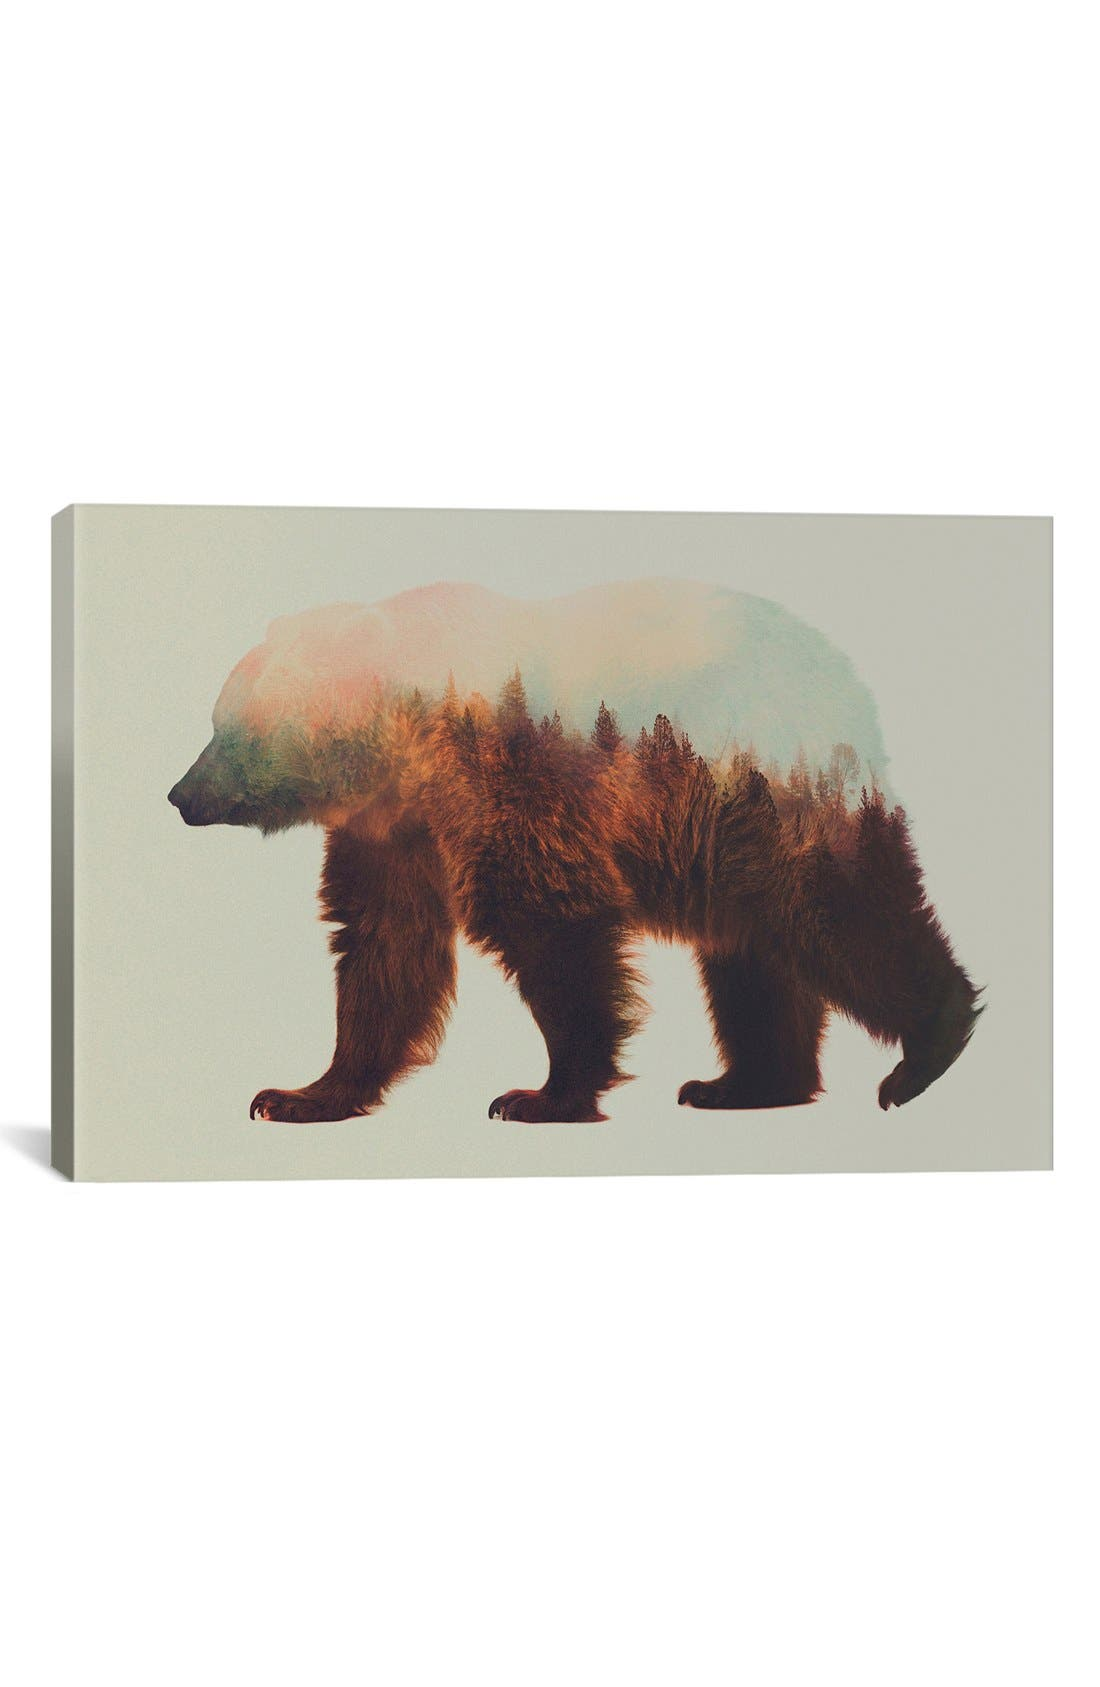 Alternate Image 1 Selected - iCanvas 'Bjorn' Giclée Print Canvas Art